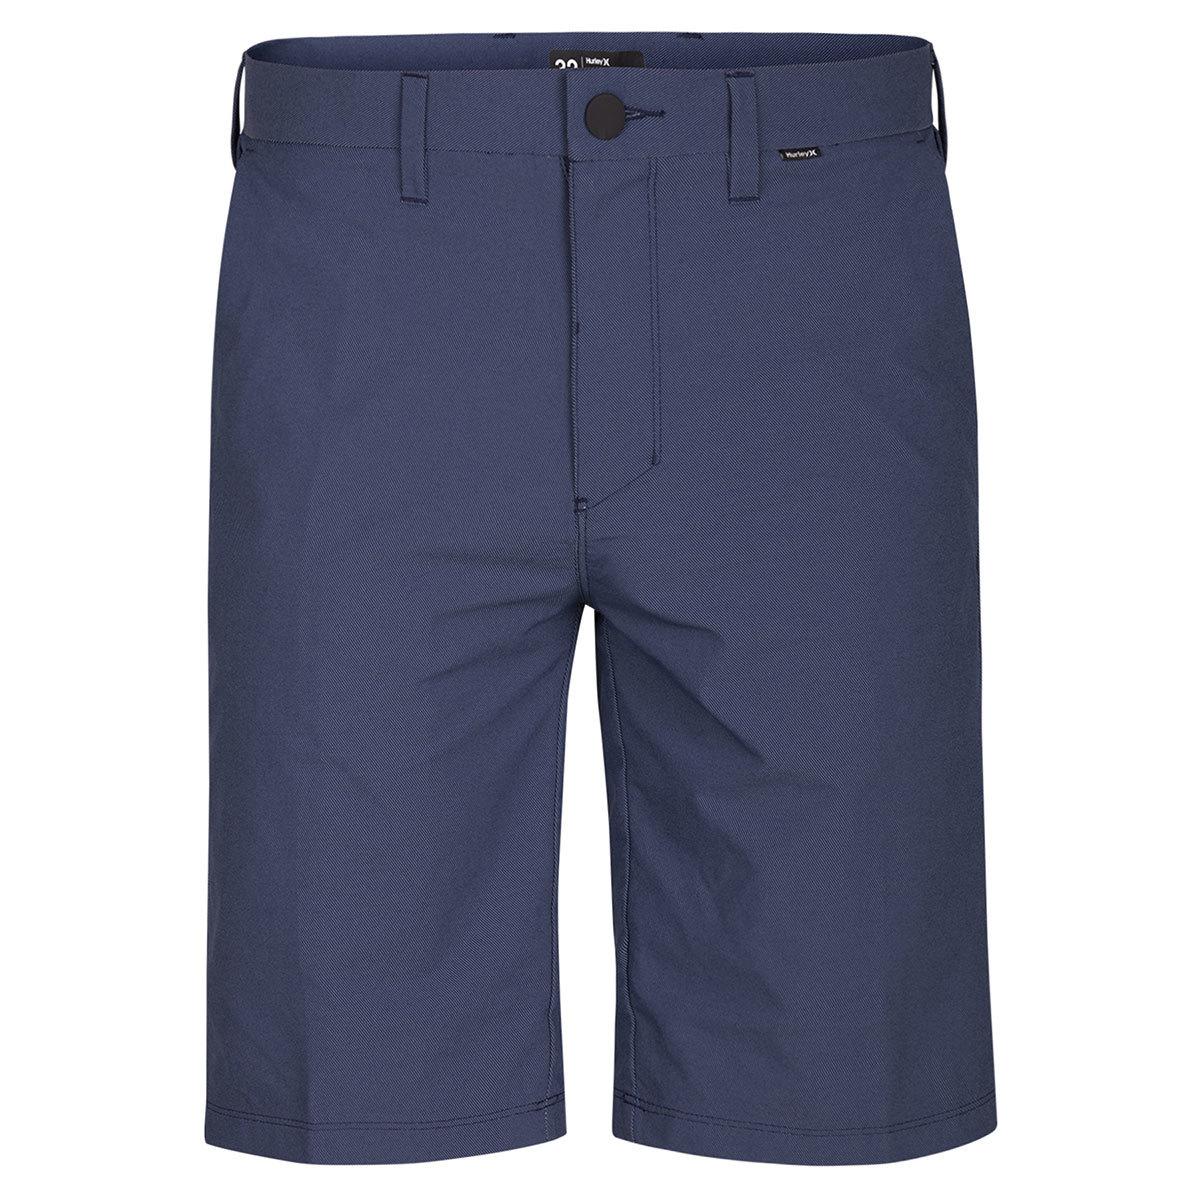 Hurley Guys' Dri-Fit Chino Shorts - Blue, 28